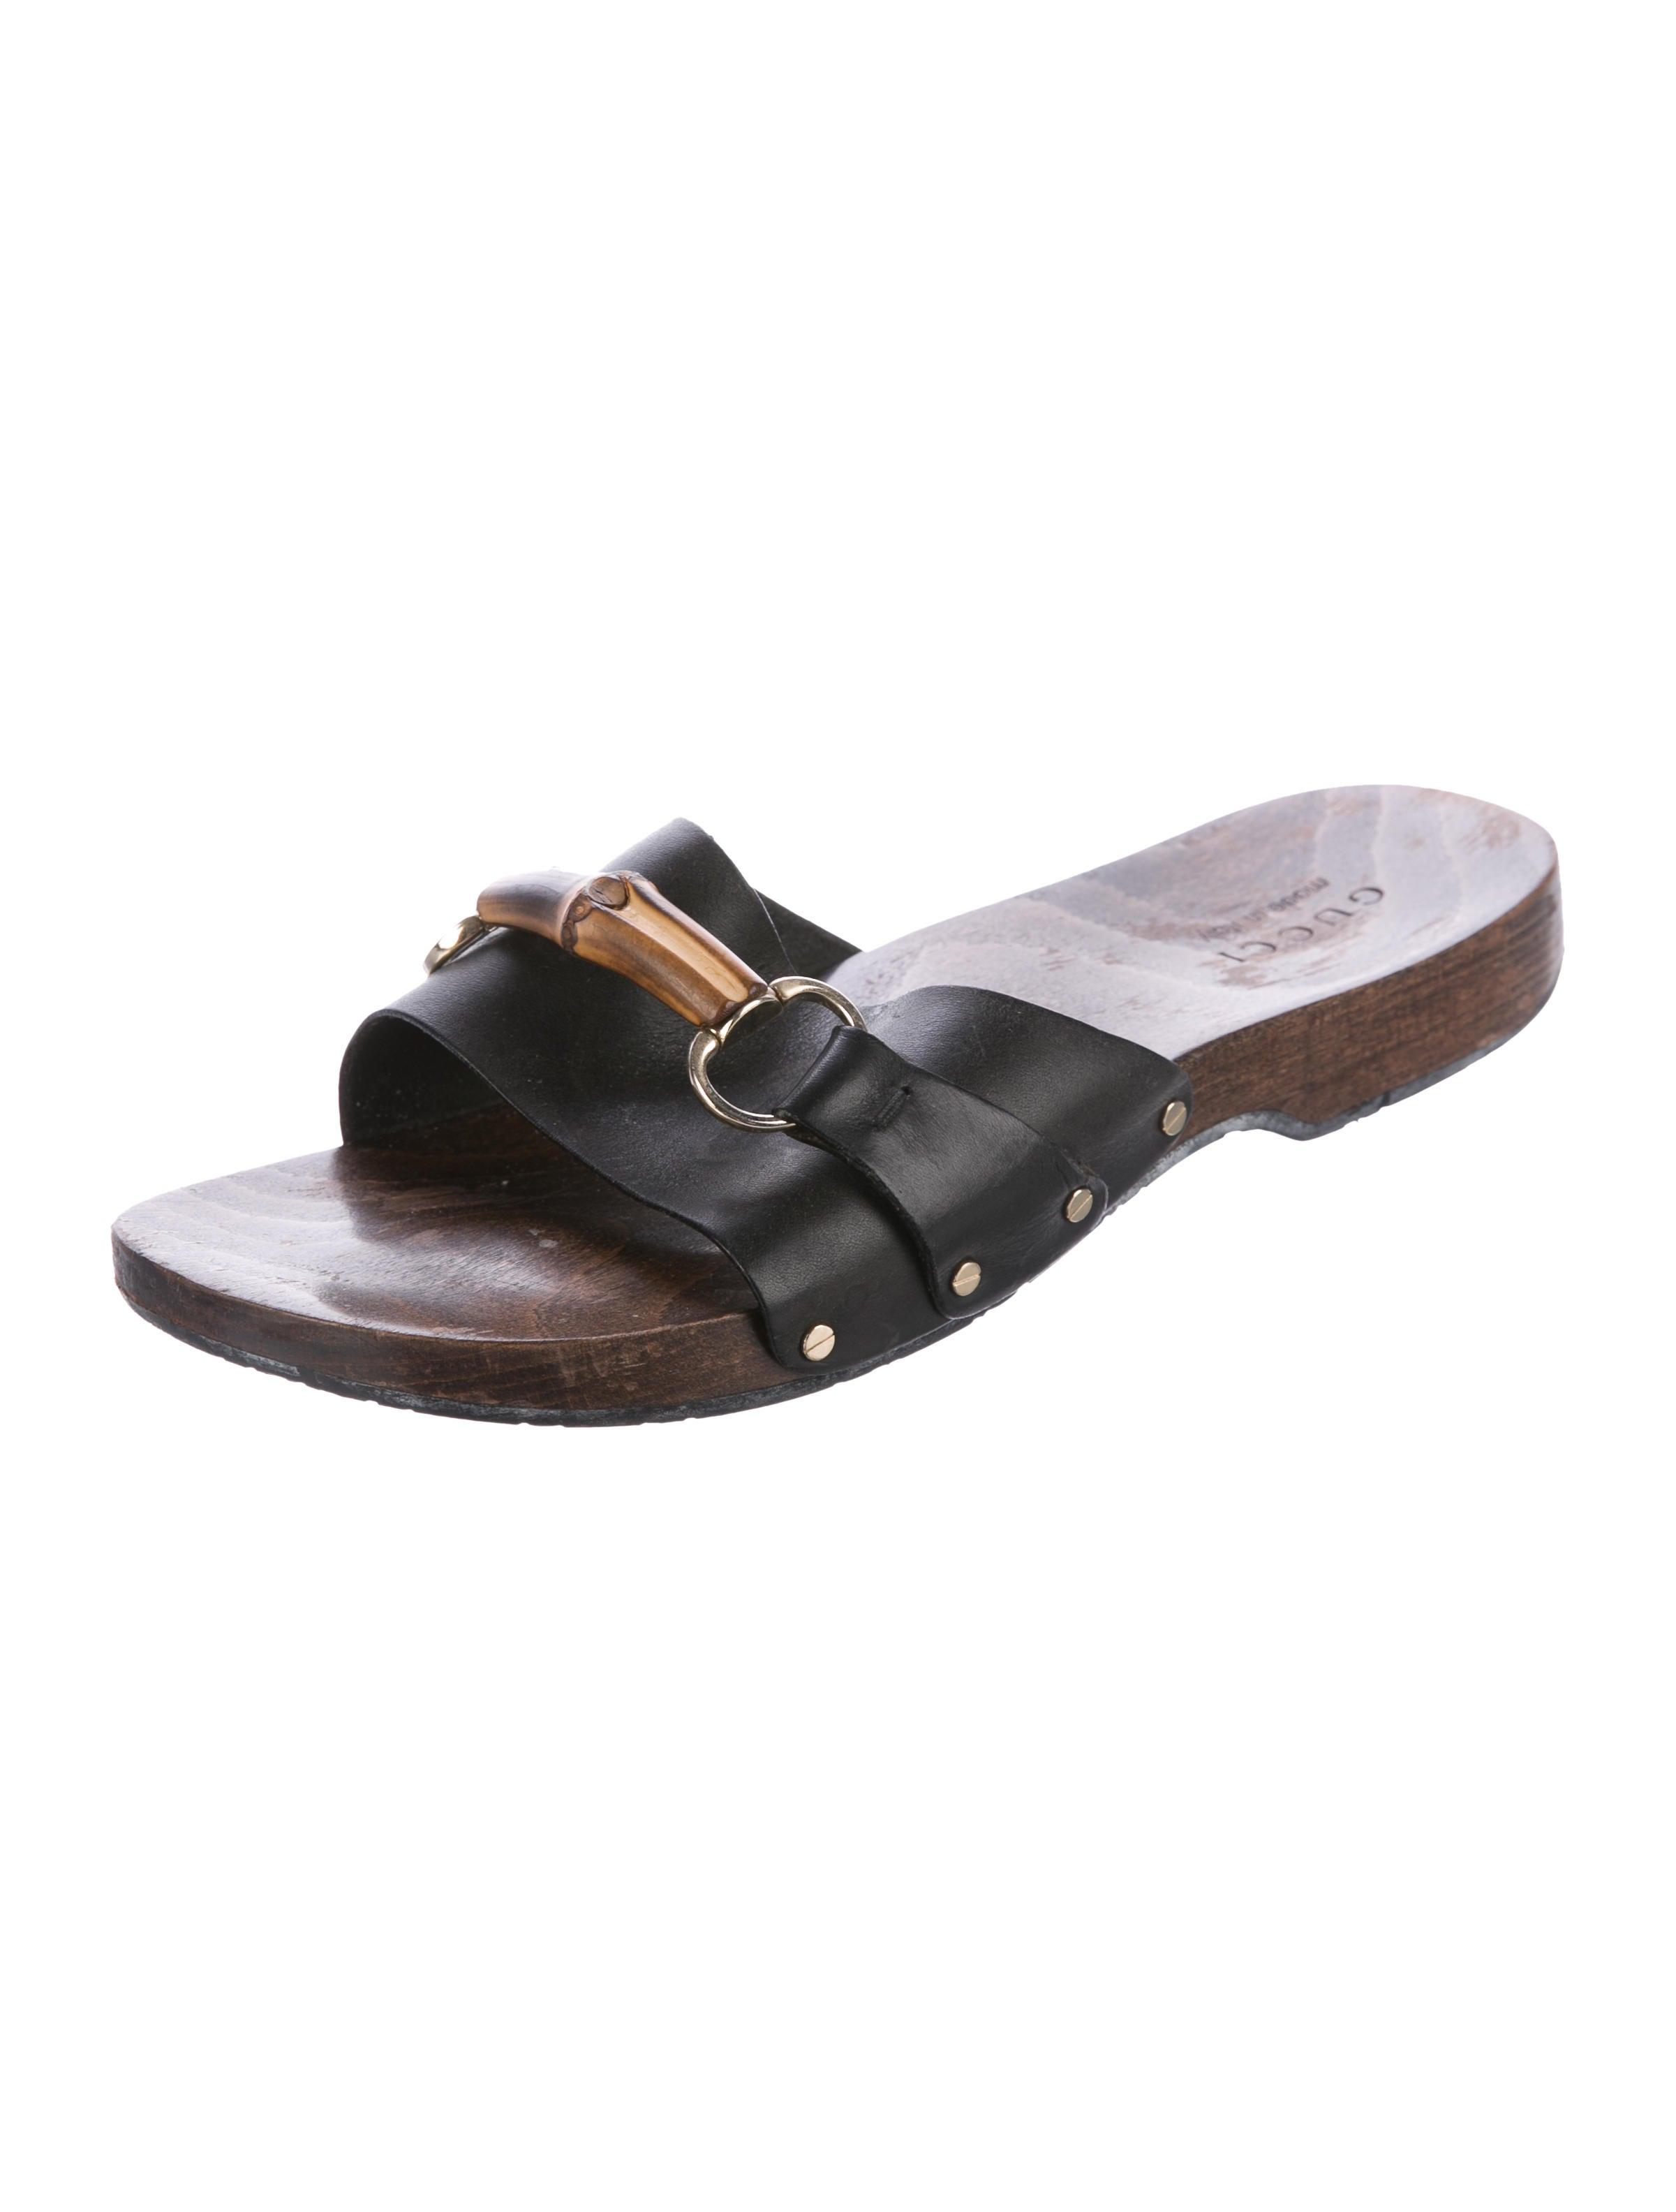 gucci leather bamboo horsebit sandals shoes guc175765